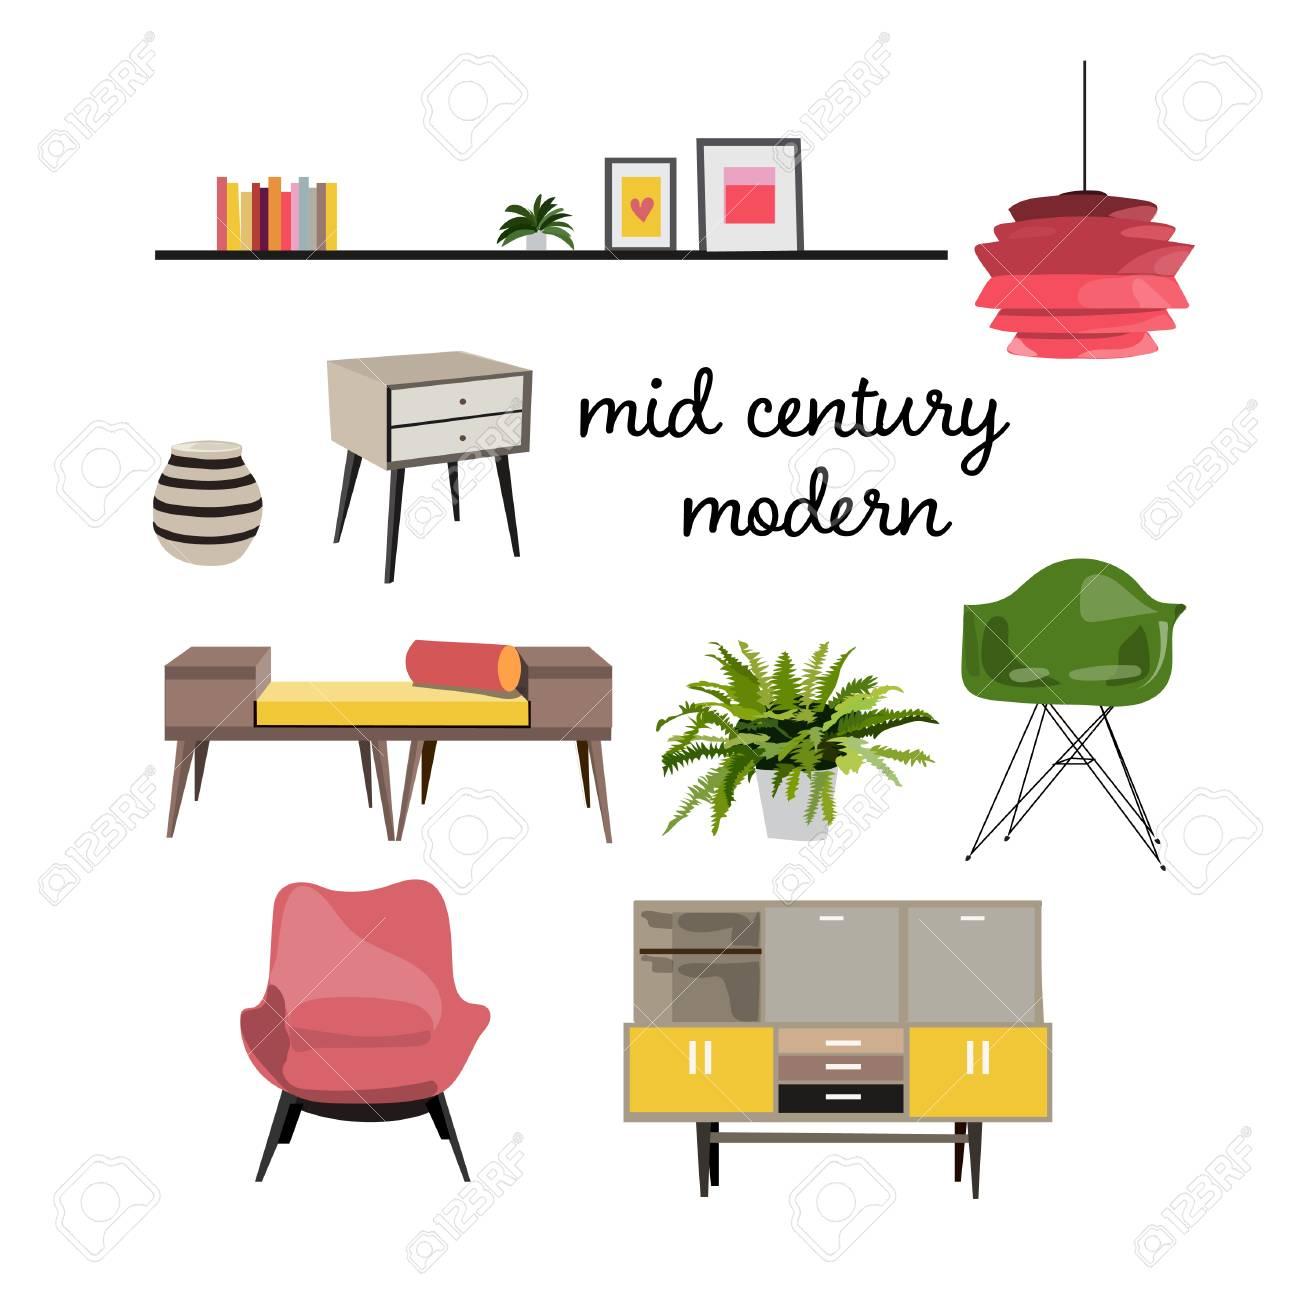 Vector vector furniture living room interior design elements illustration mid century modern retro style mood board